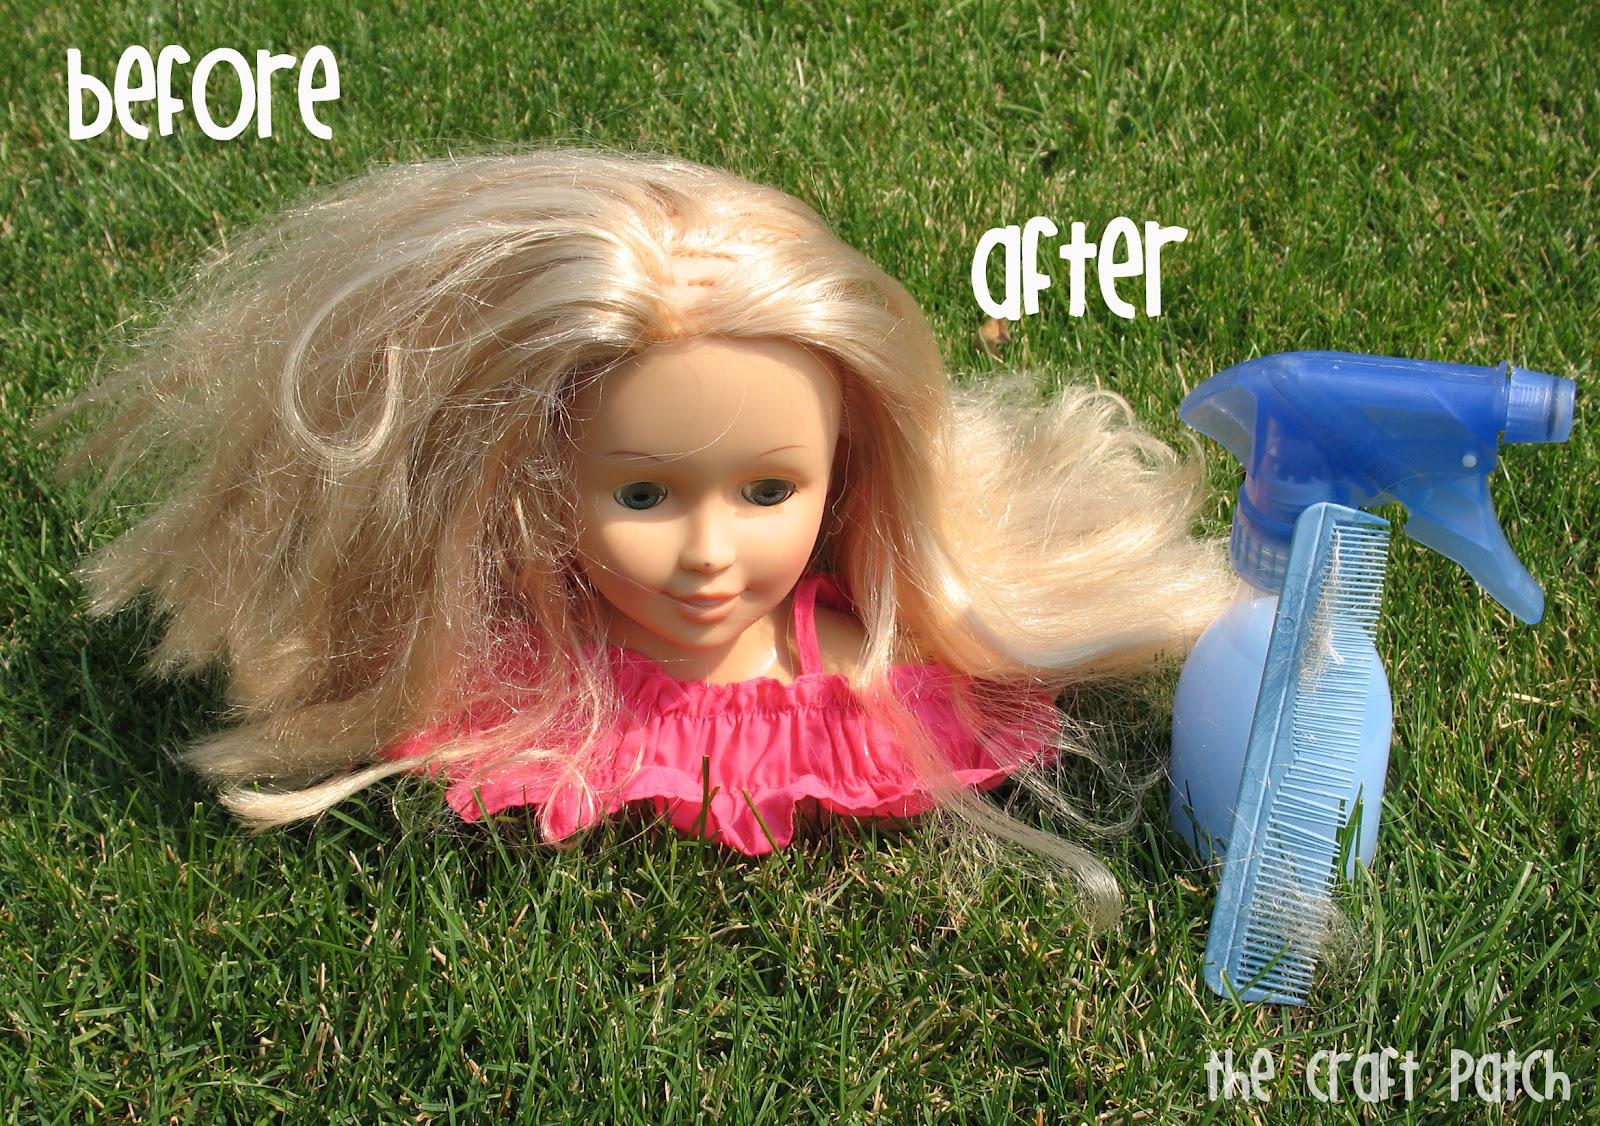 pinterest tested doll hair detangler. Black Bedroom Furniture Sets. Home Design Ideas